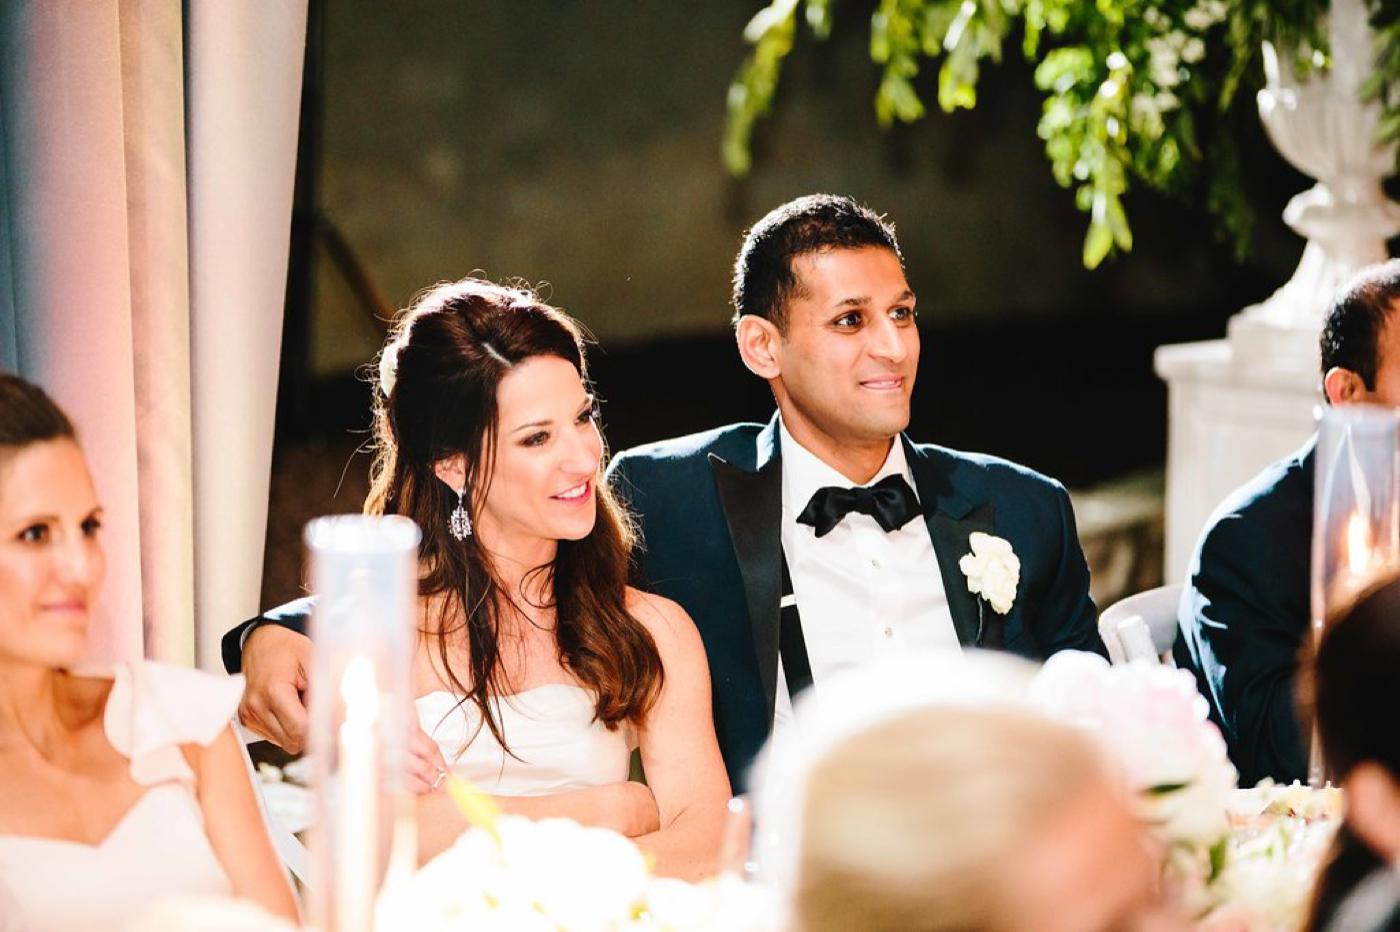 chicago-fine-art-wedding-photography-sakamuri85